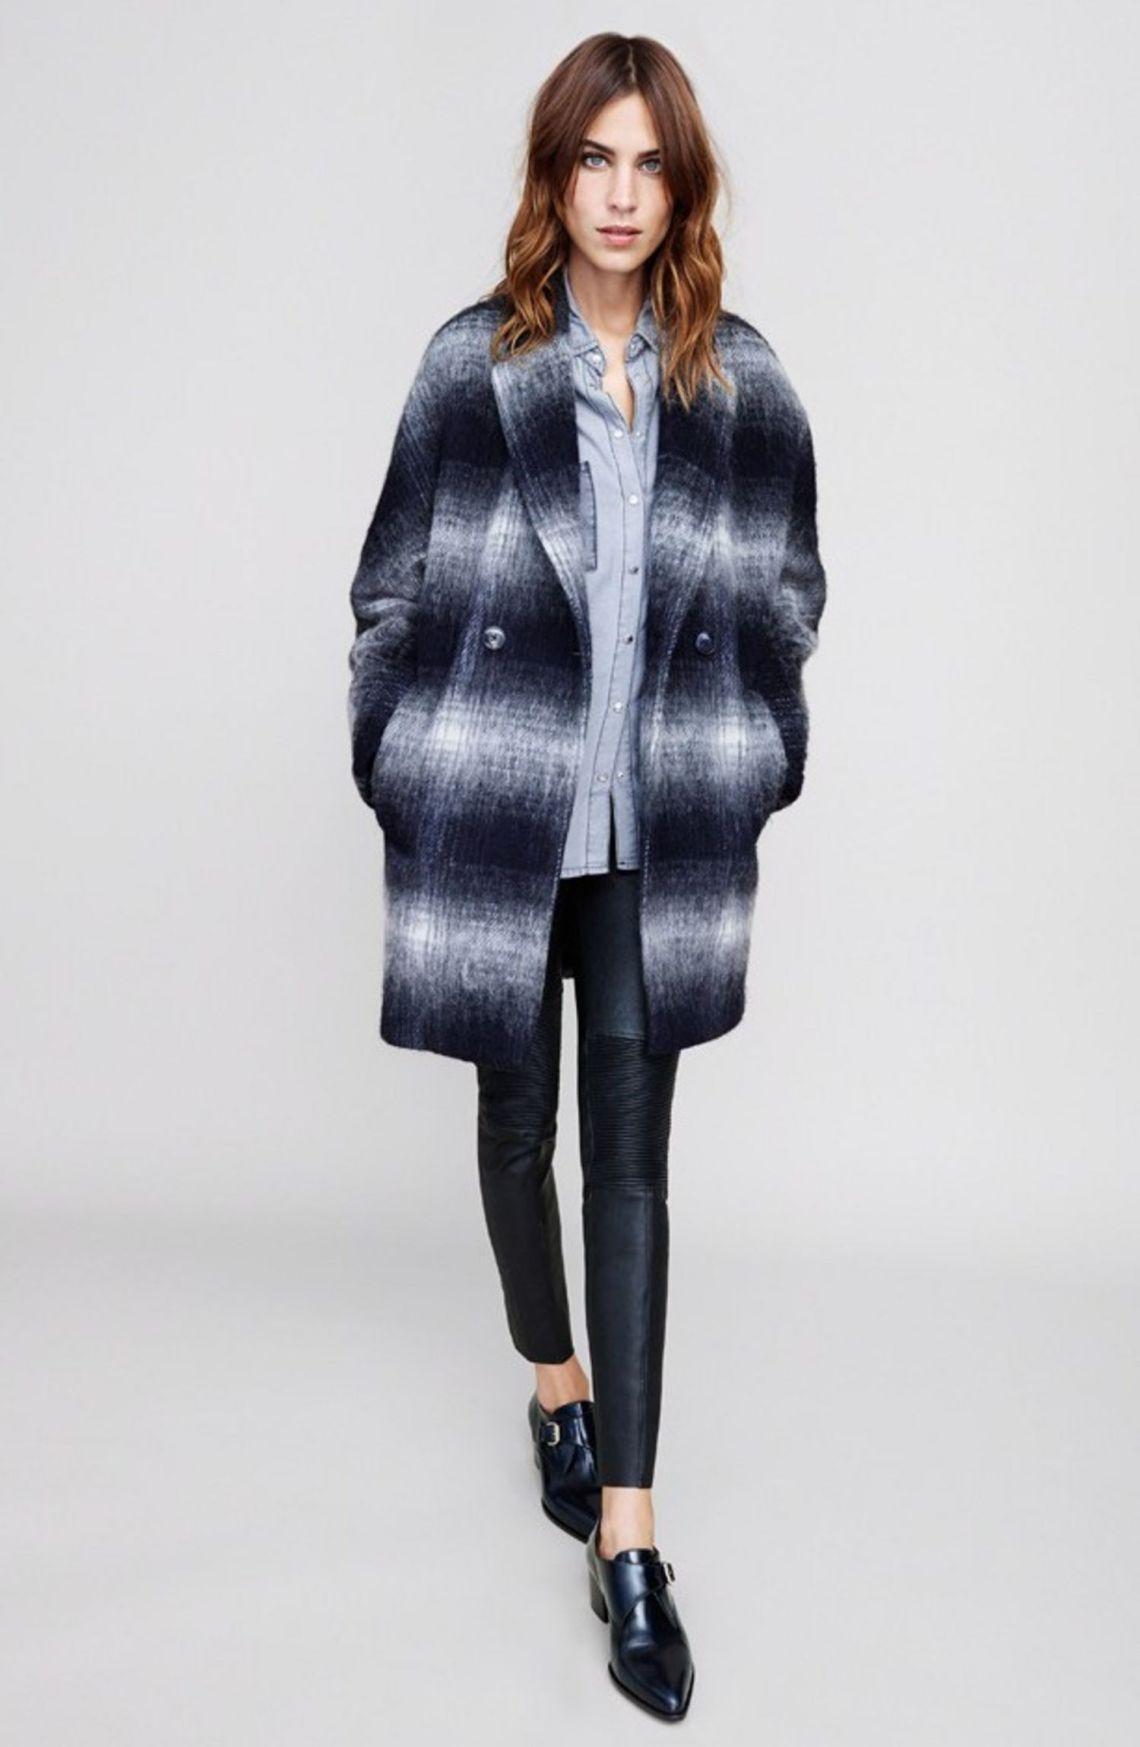 Alexa and her Tommy Hilfiger plaid coat